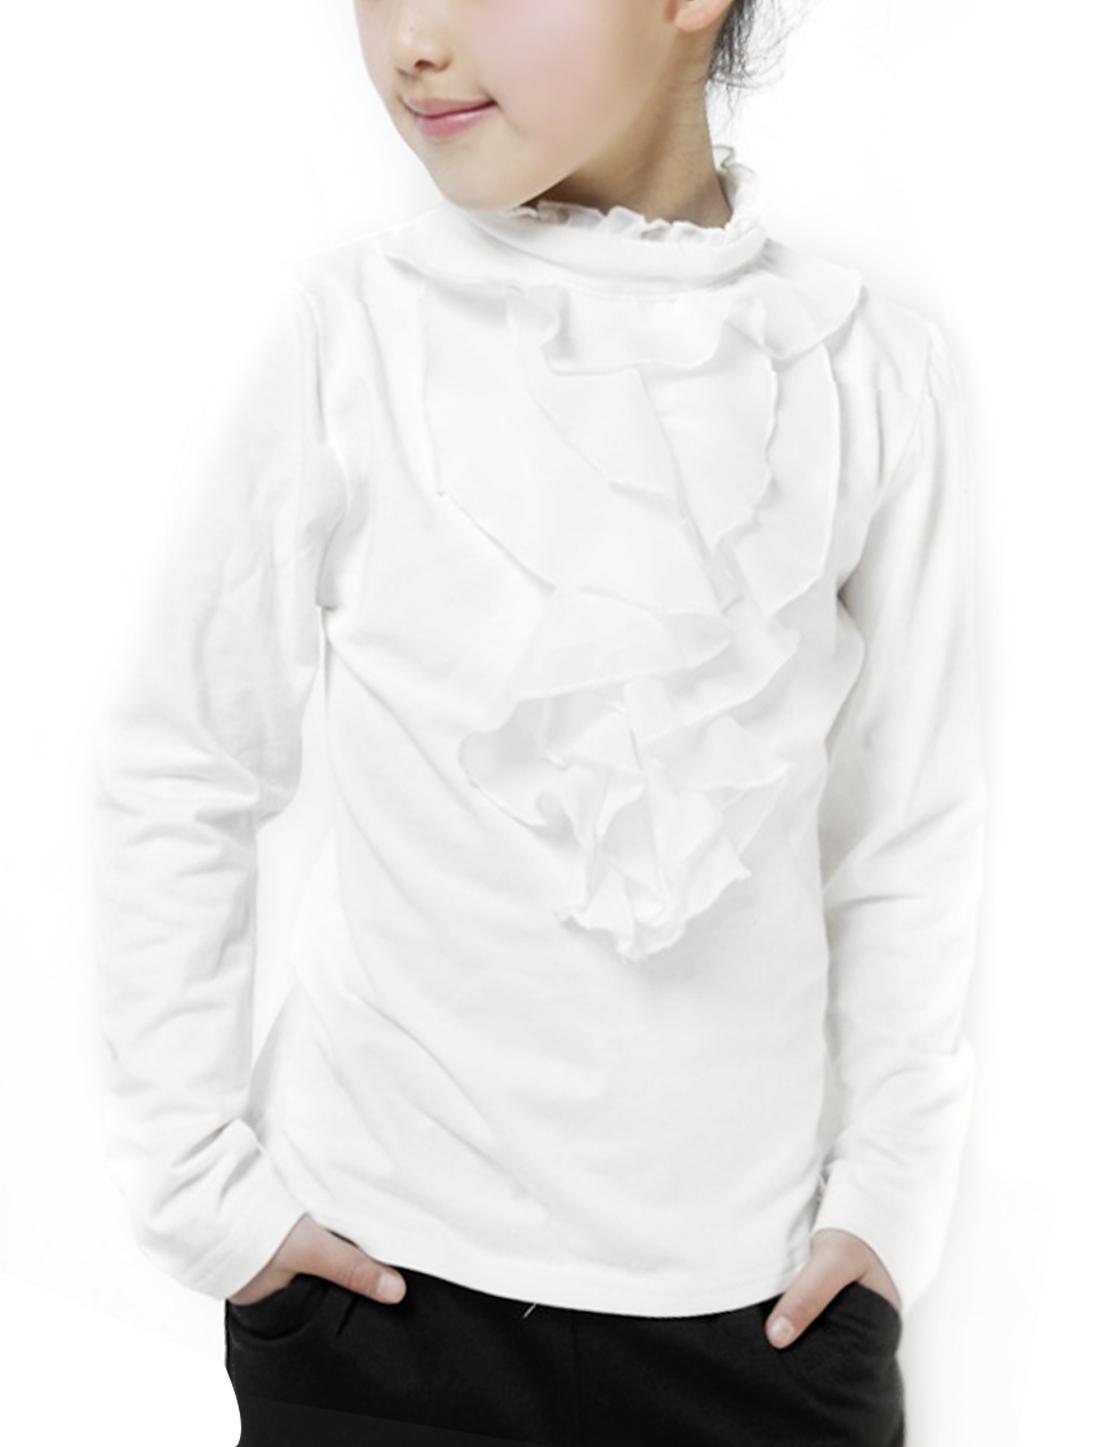 Girls Long Sleeve Flouncing Top Shirt White 5